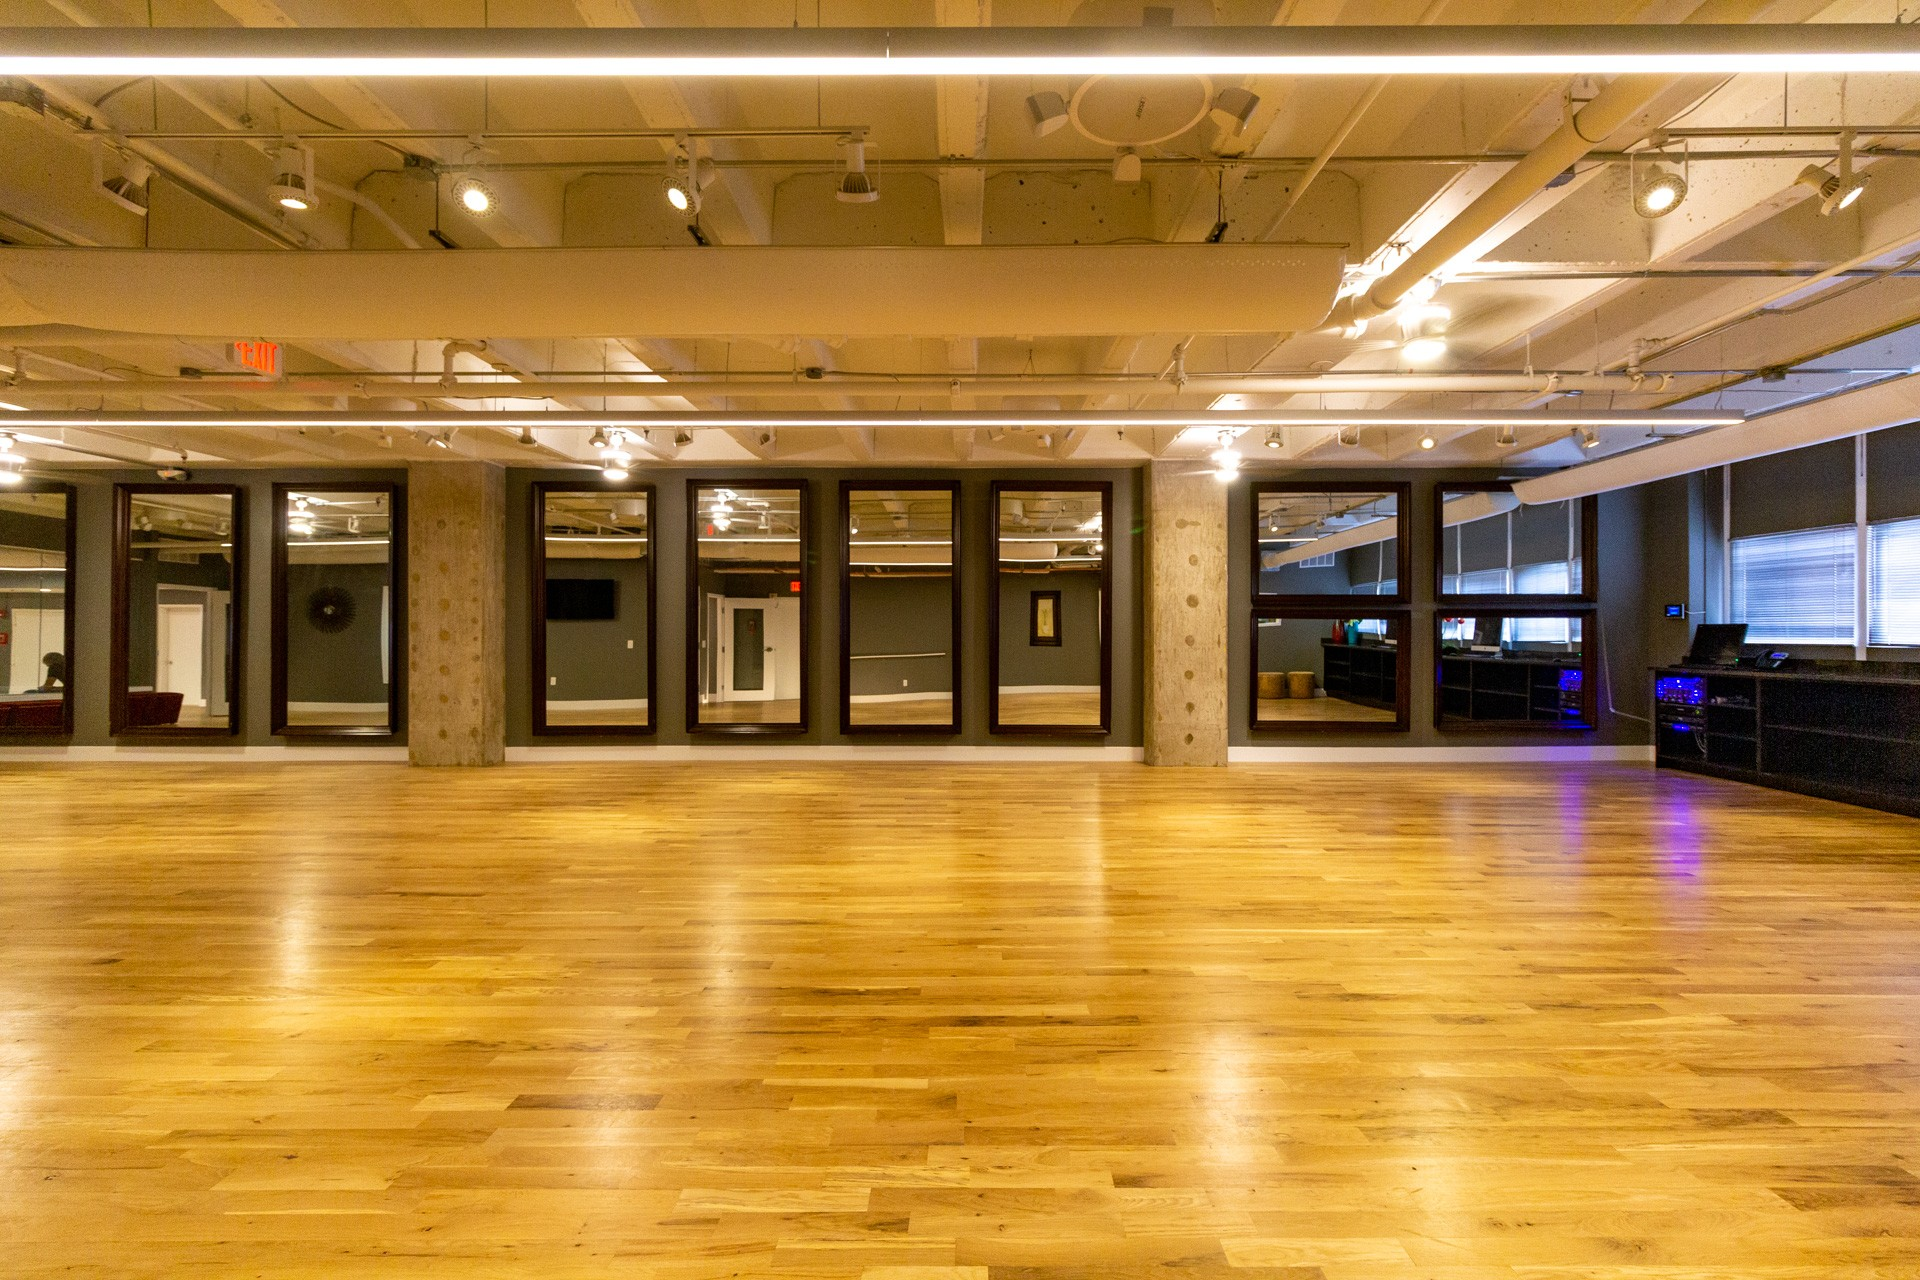 Ballroom floor at Arthur Murray Dance Studio of Philadelphia, PA